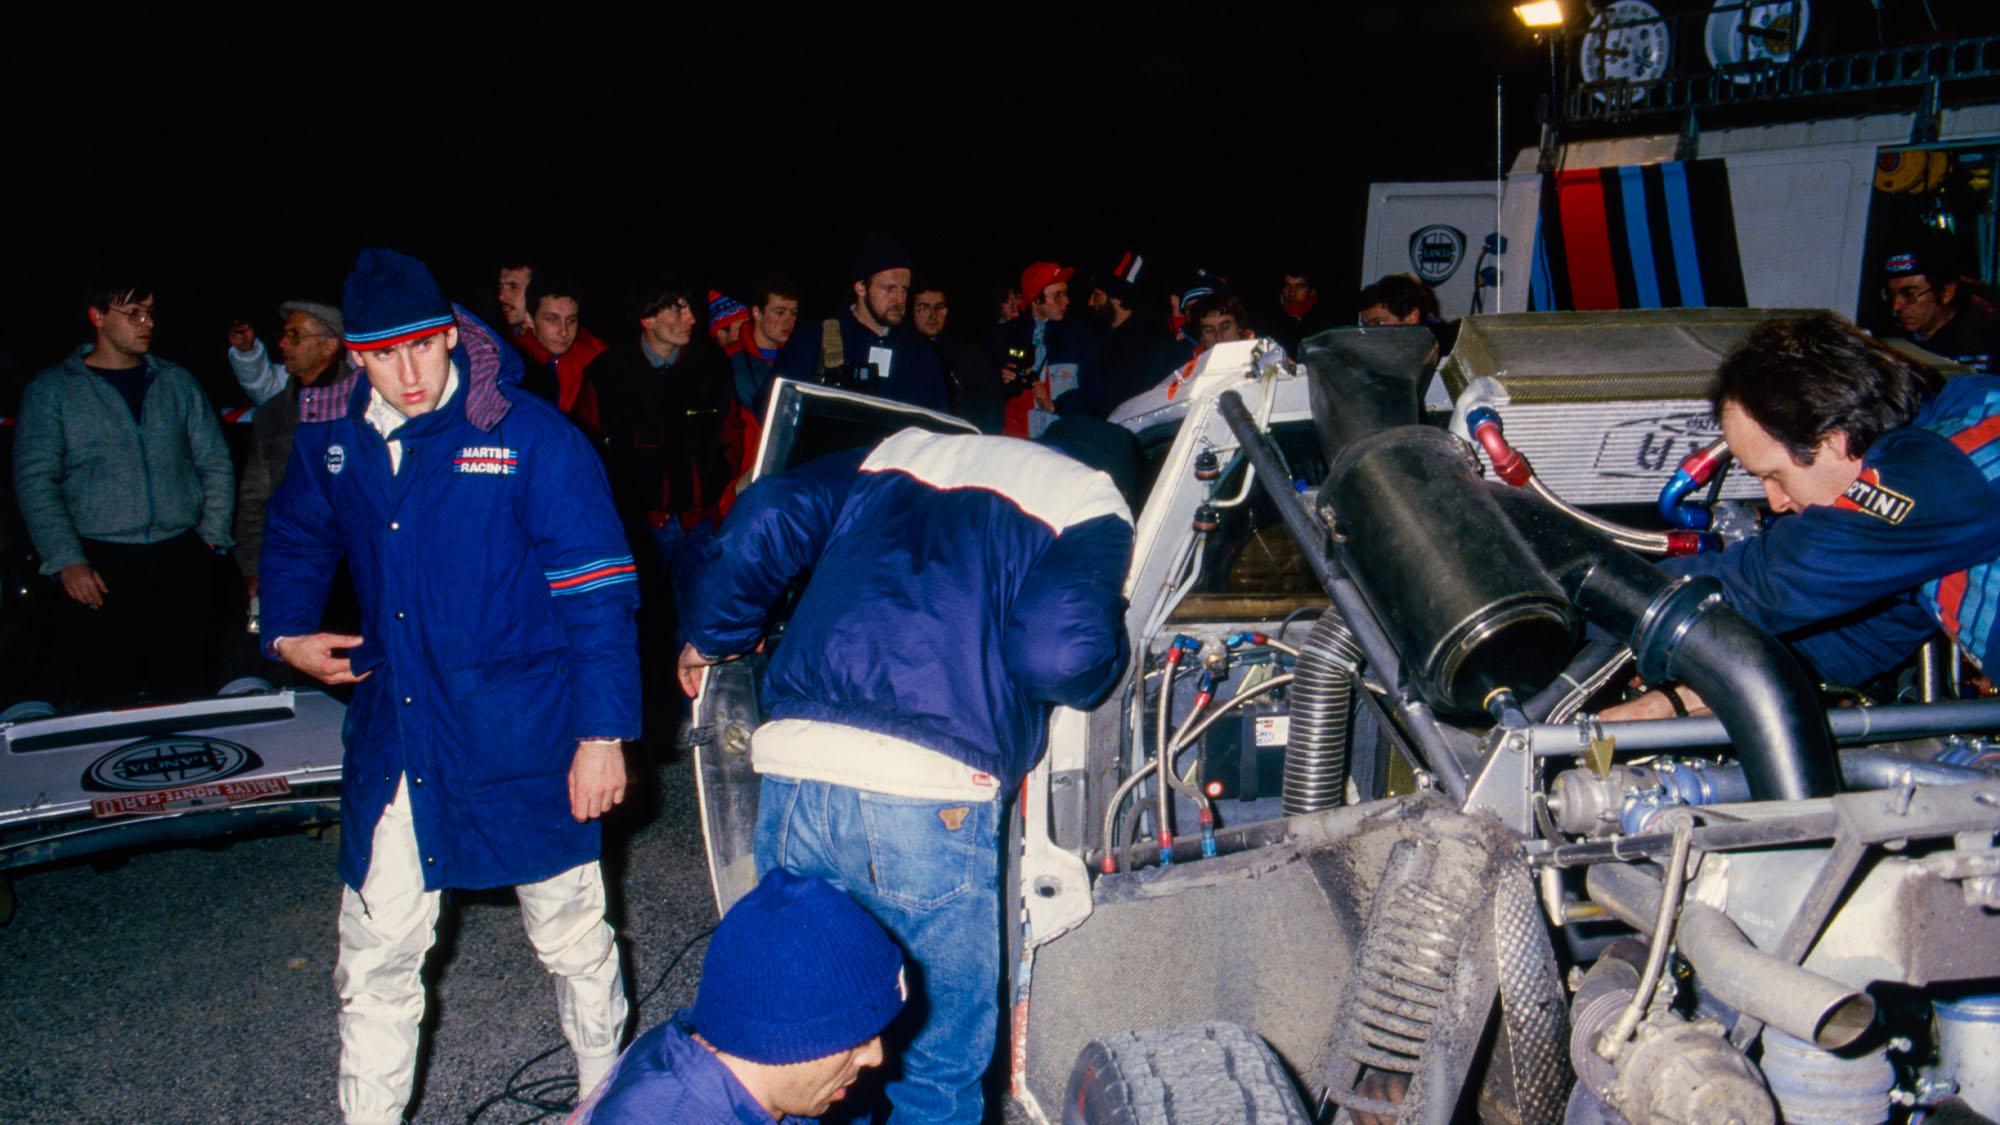 07 Toivonen Henri (fin), Cresto Sergio (usa), Lancia Martini, Lancia Delta S4, ambiance during the 1986 Rallye Automobile de Monte-Carlo 1986, 1st round of the 1986 World Rally Championship, from January 18 to 24, 1986 between Aix -les-Bains and Monaco - Photo DPPI